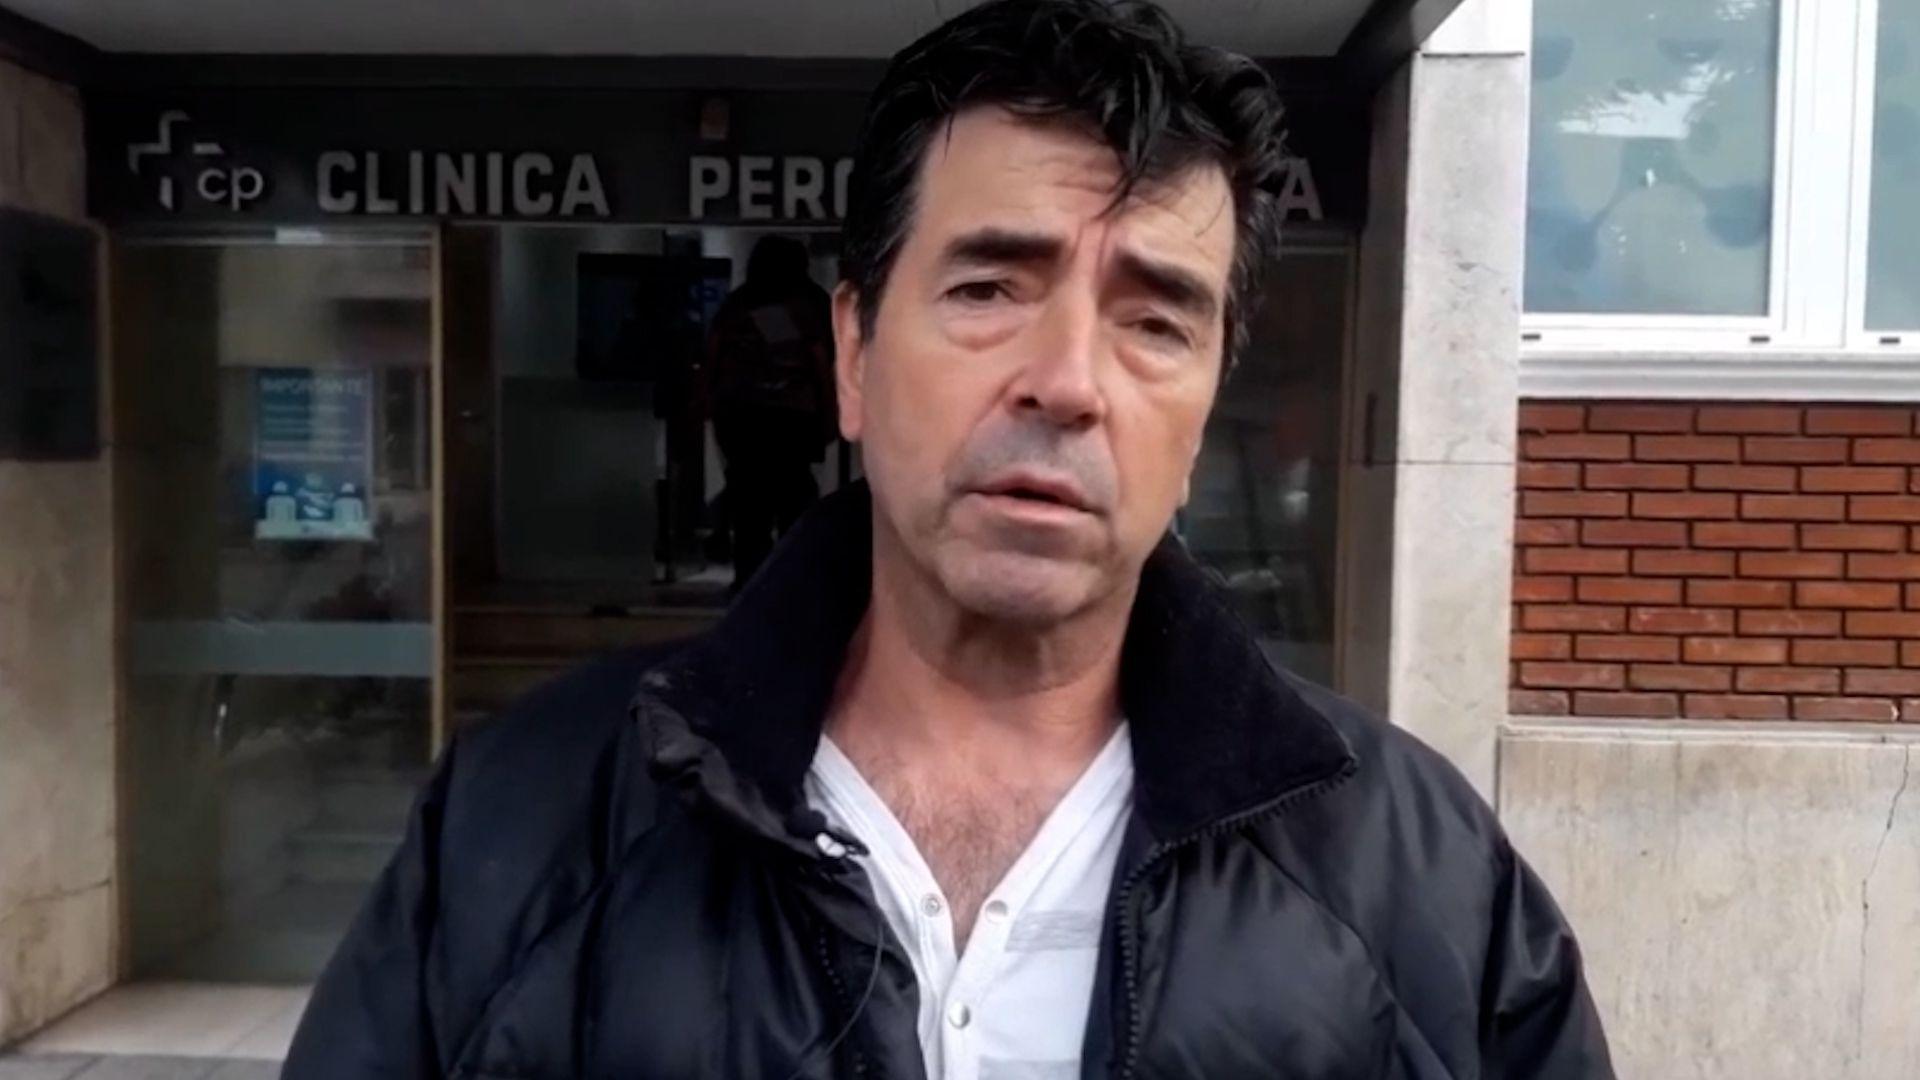 Julio Fernandez Marido Camila Perisse